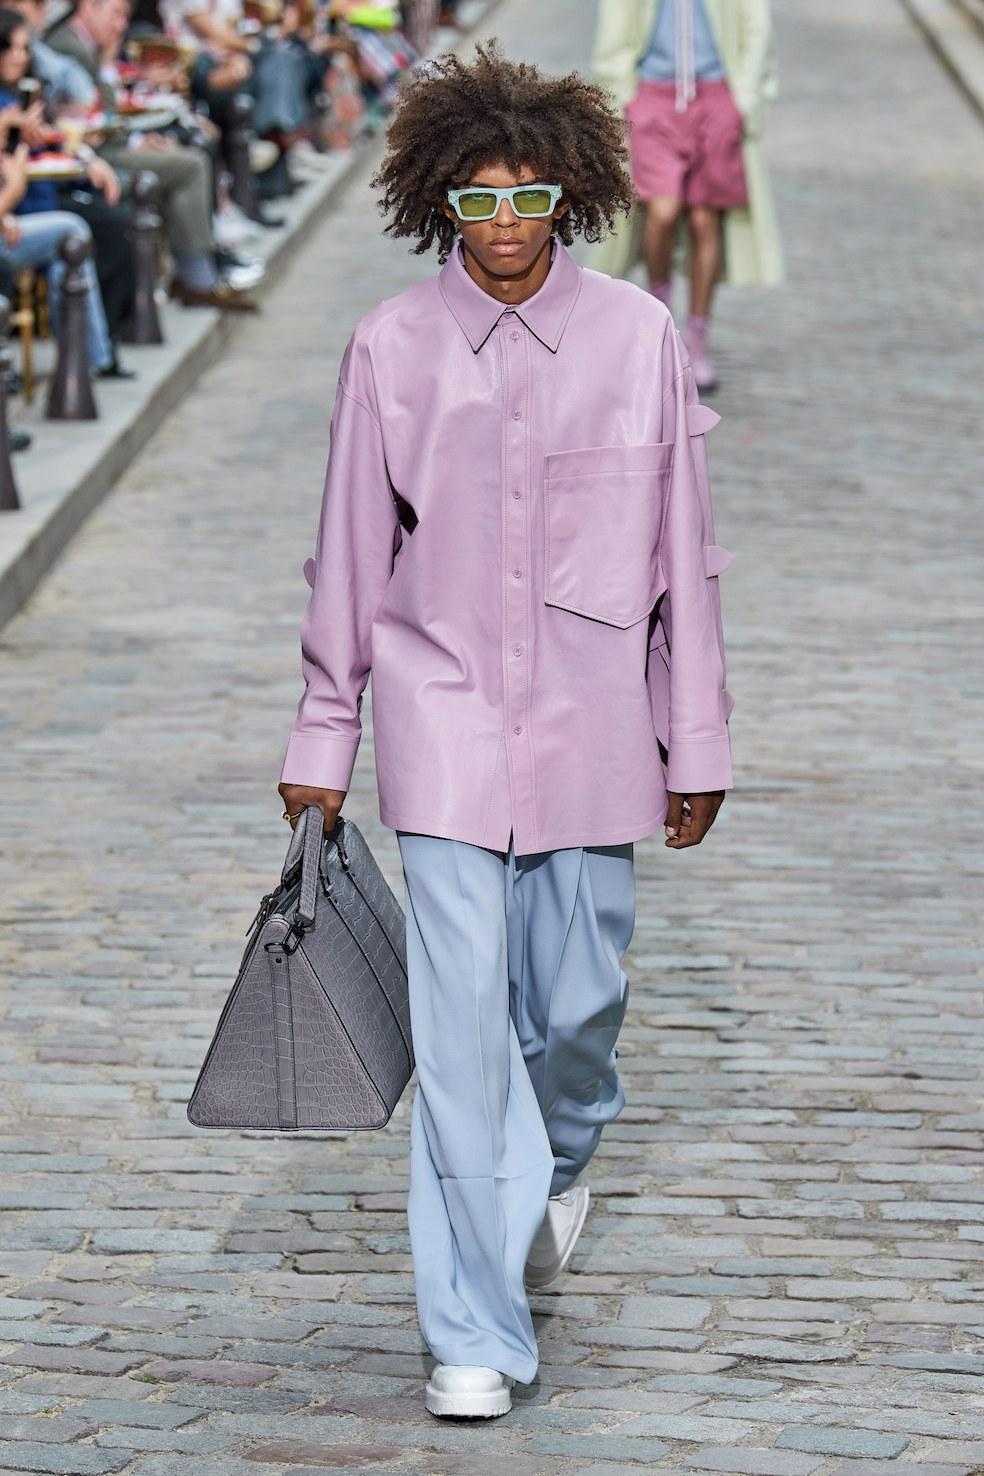 Louis_Vuitton_SS20_Behind_The_Blinds_Magazine__FIO0084.jpg